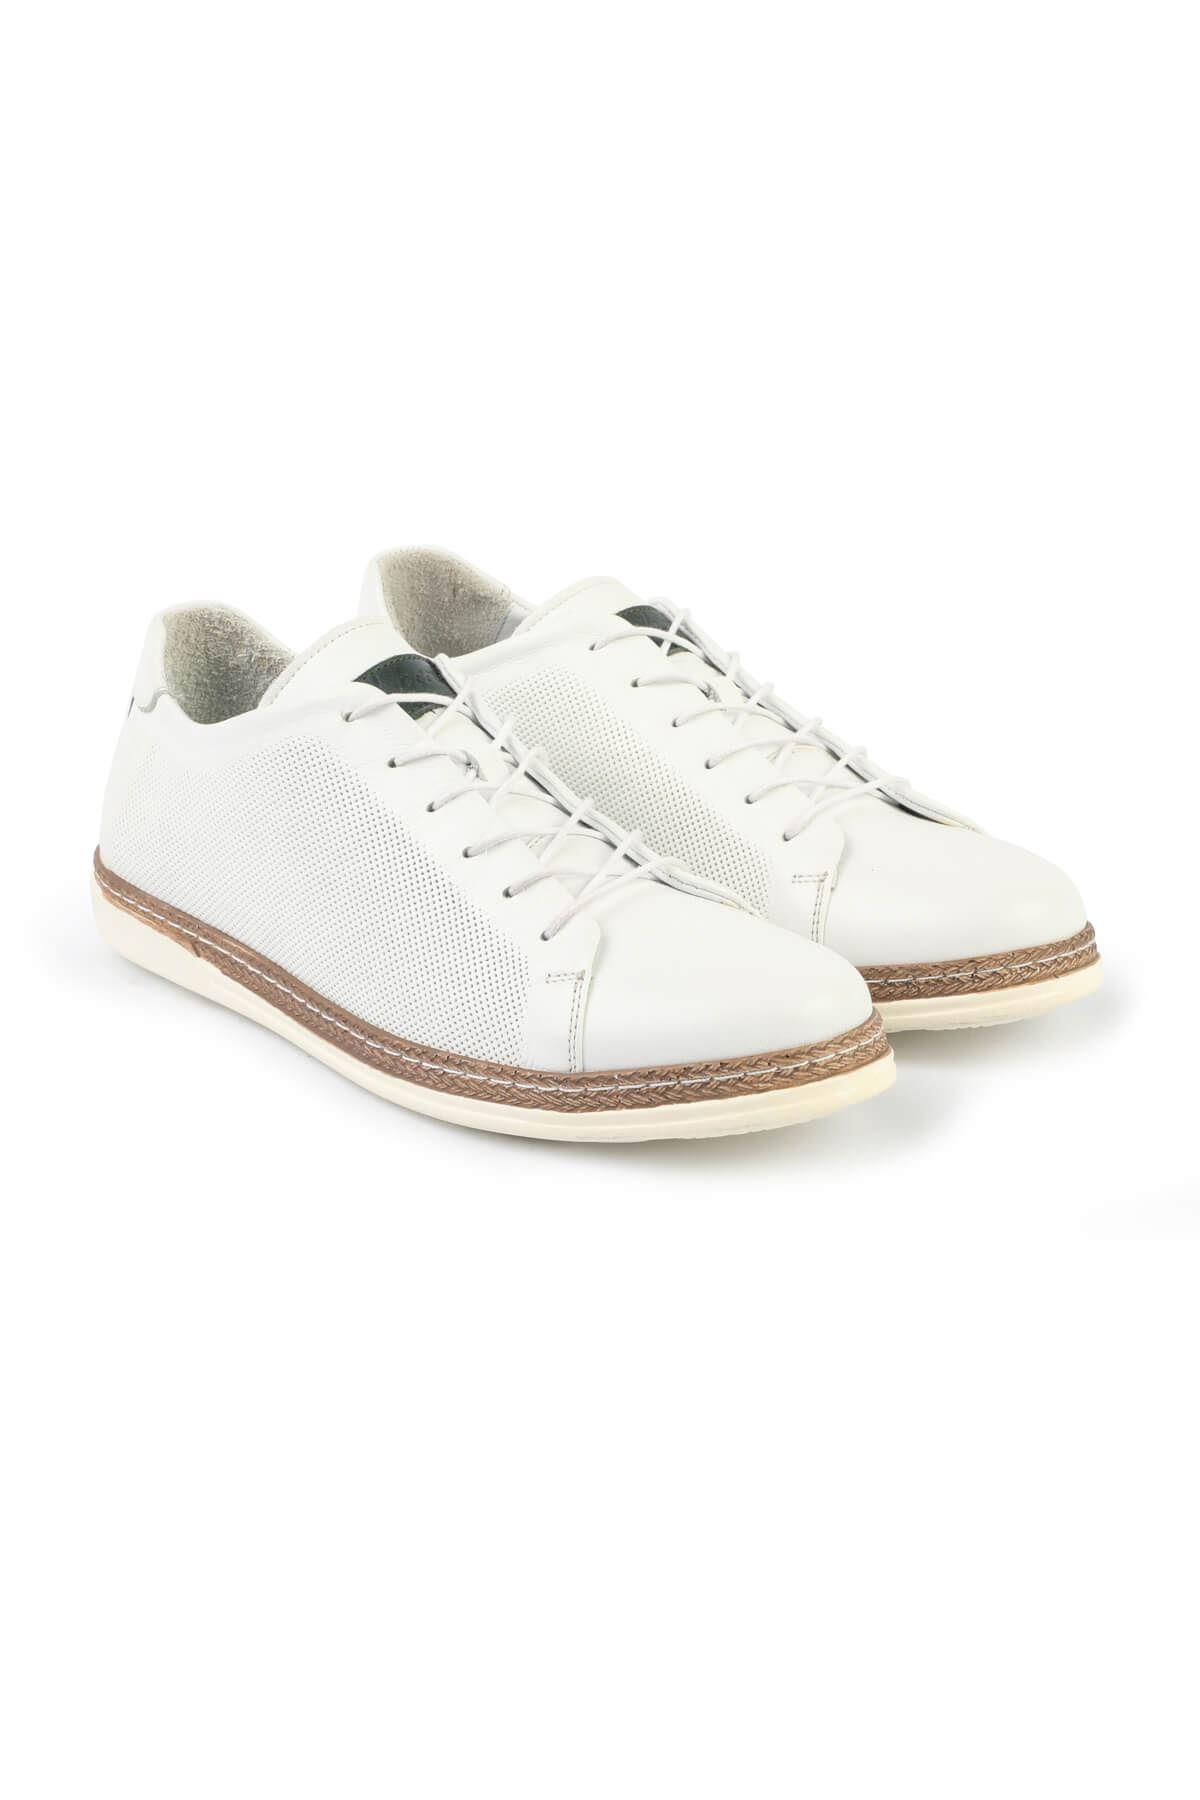 Libero C780 White Casual Shoes